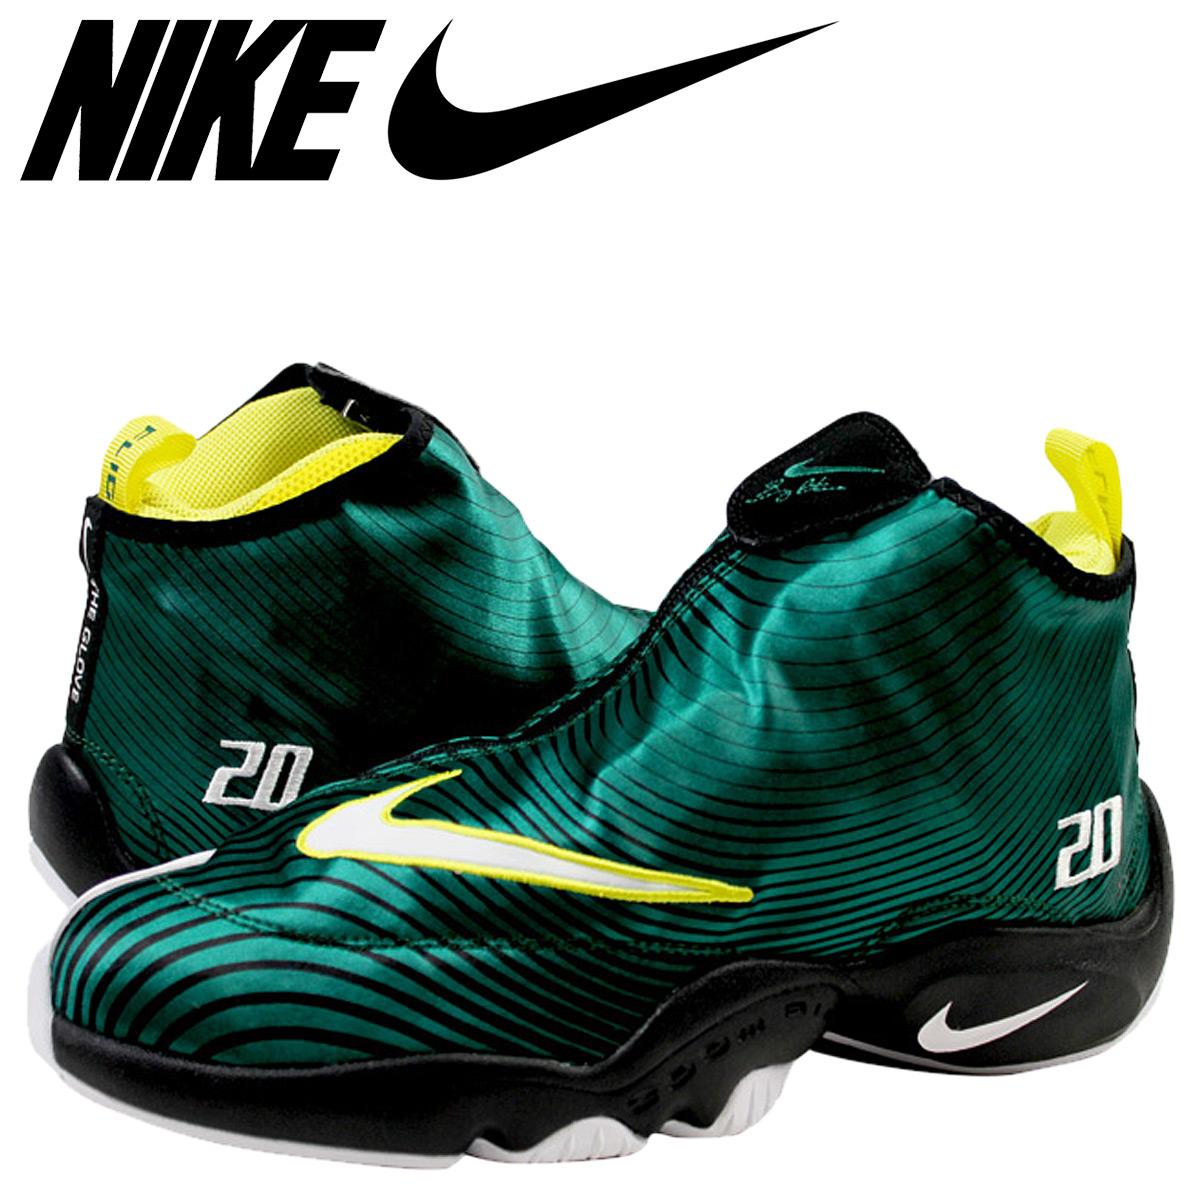 0182726ffbd5 Nike NIKE Air Zoom flight sneaker AIR ZOOM FLIGHT THE GLOVE QS SC AFII the  globe 630773-300 green mens